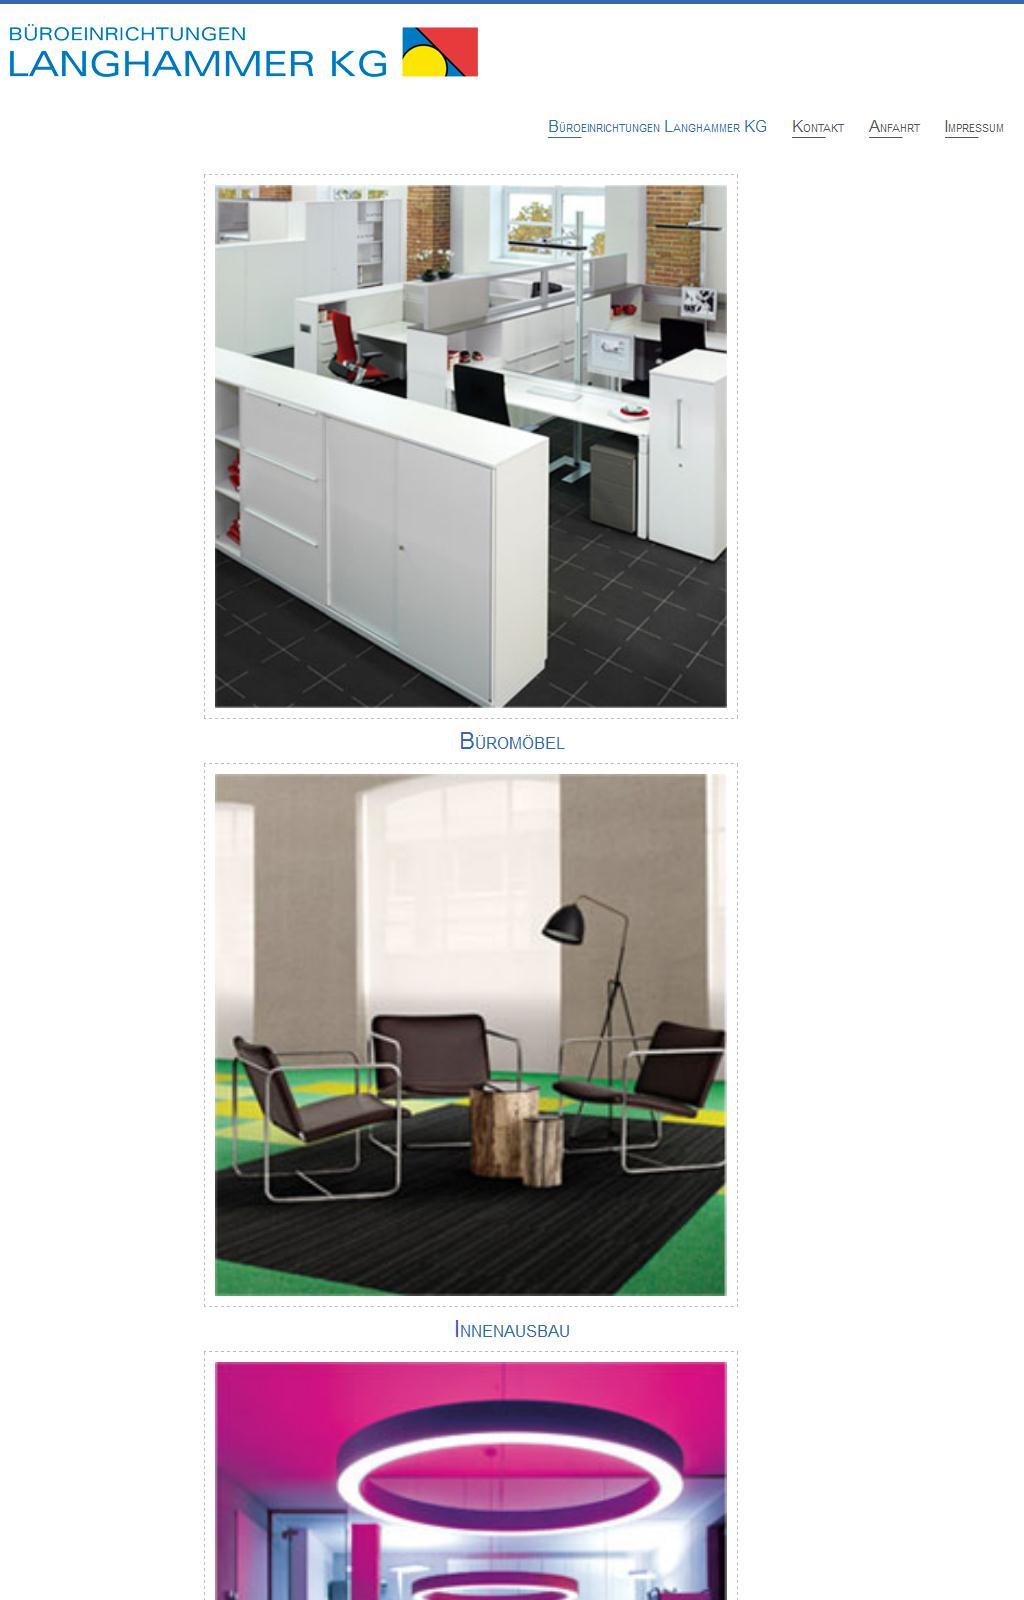 Websites of Büro & Objekteinrichtungen Langhammer KG | Trade Nosis